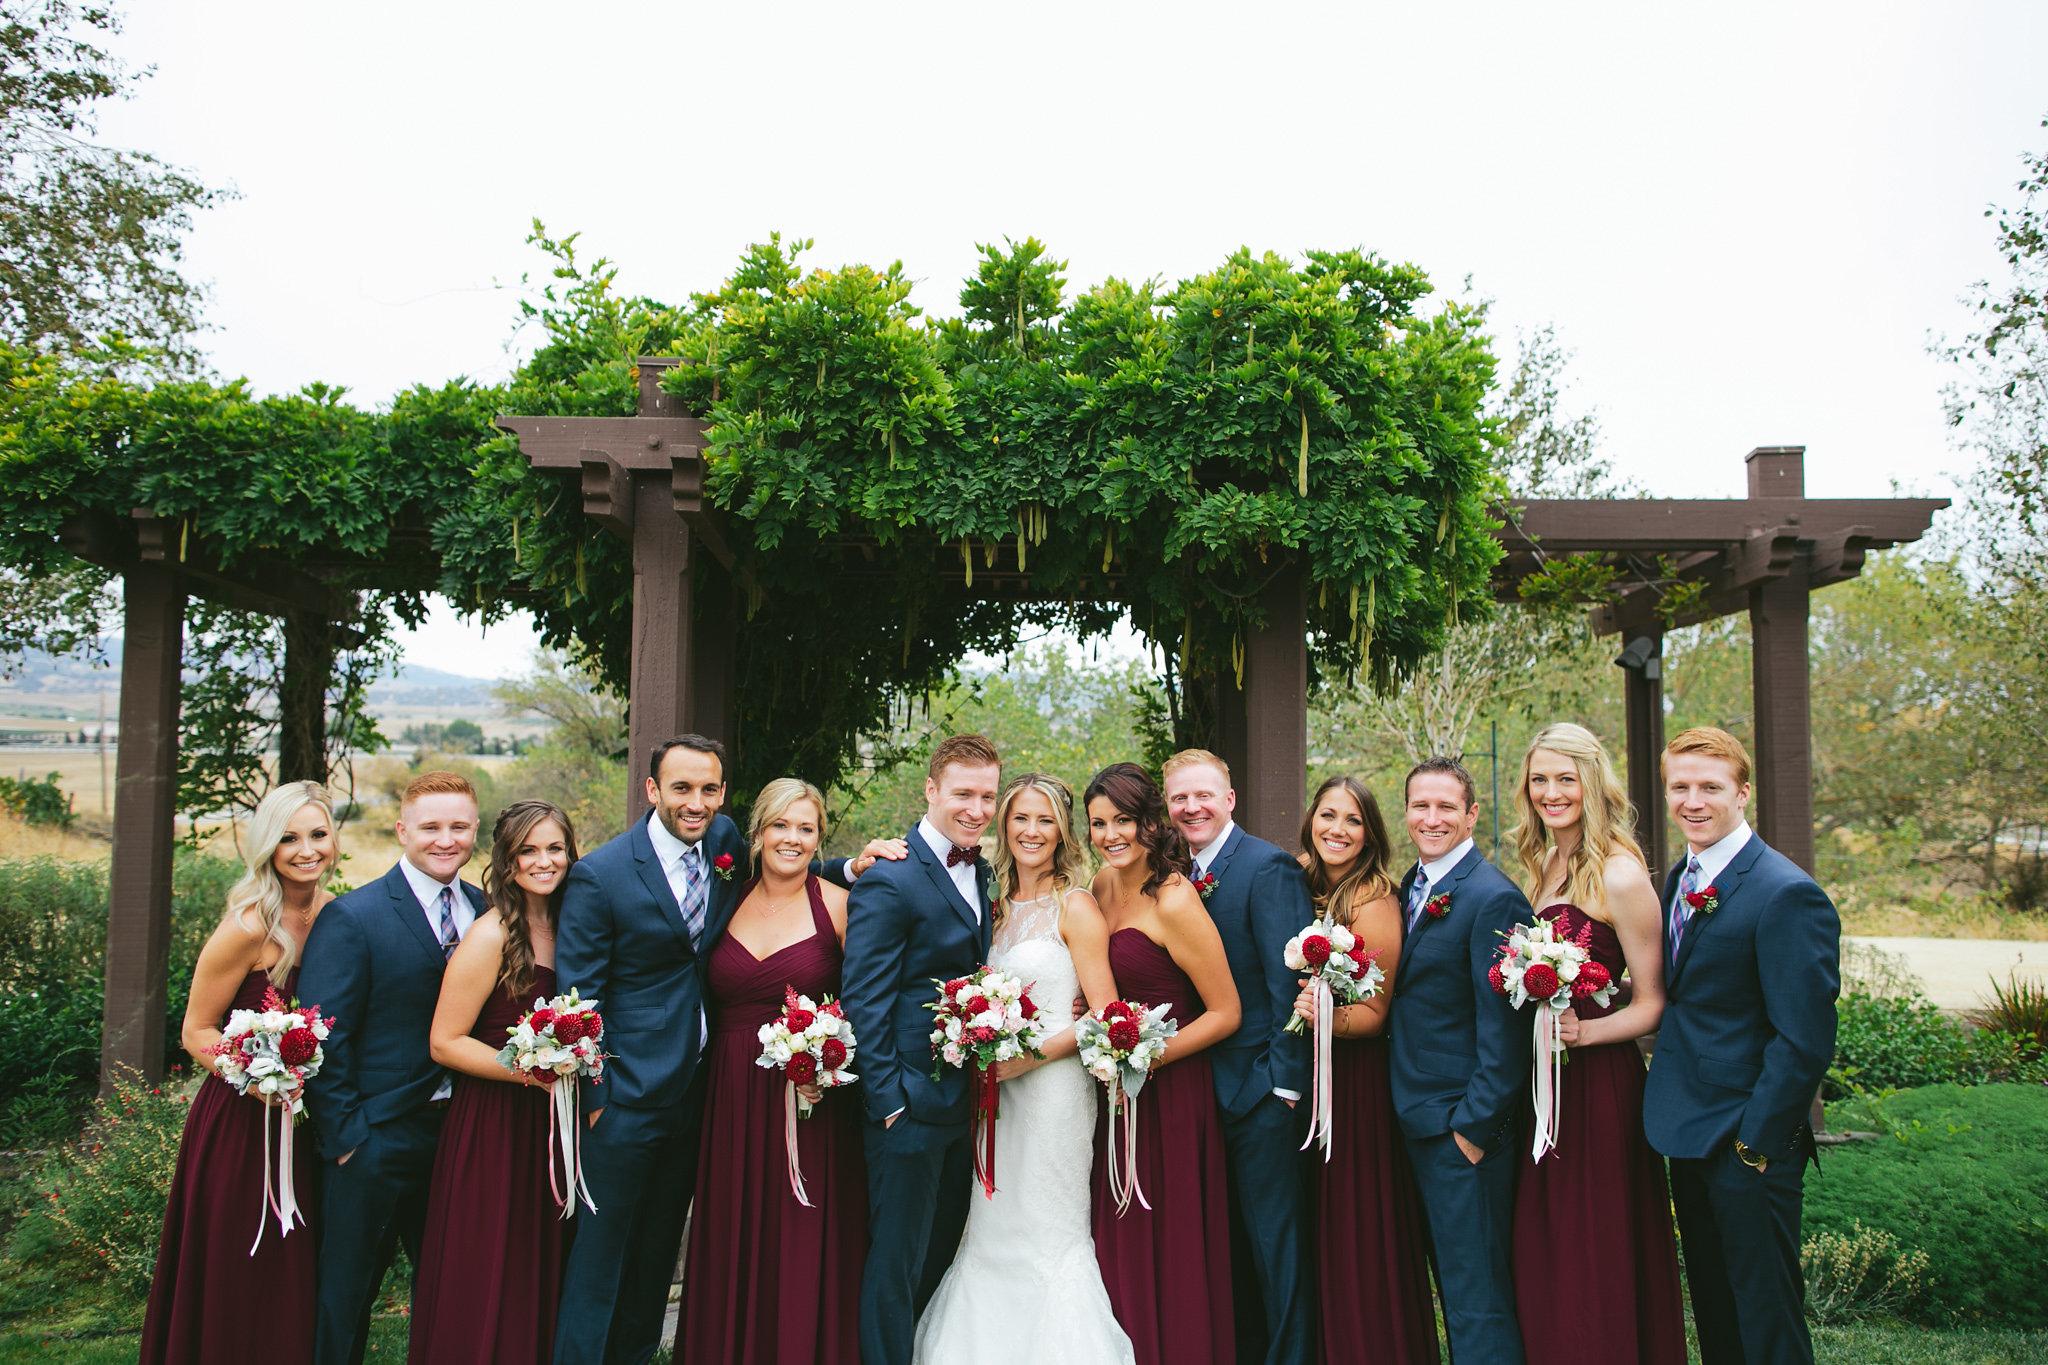 Kristen+Nick-WEDDING_WEB-244.jpg